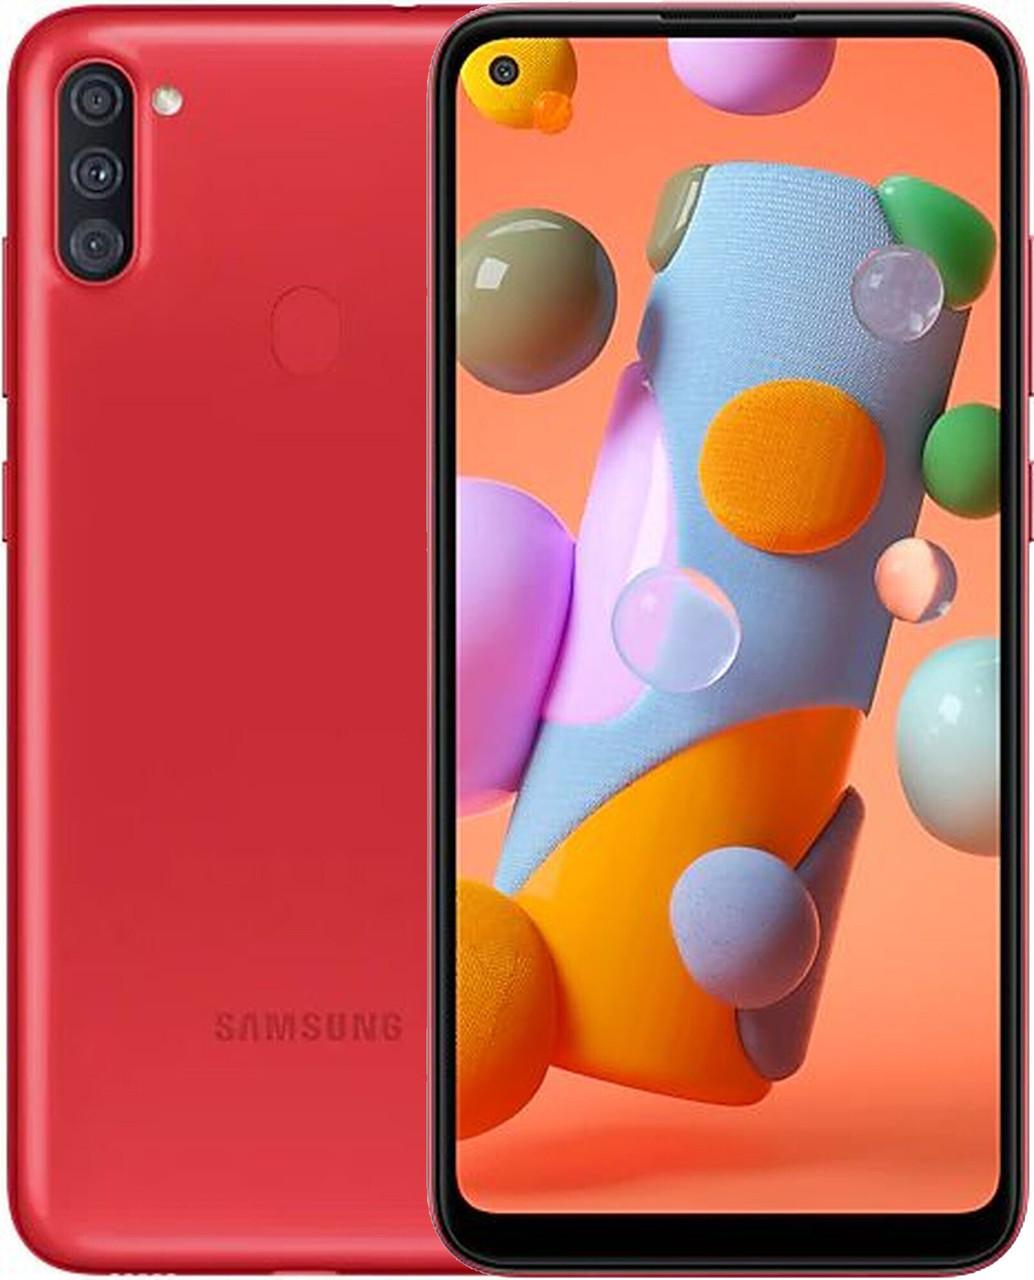 Смартфон Samsung Galaxy A11 Red (SM-A115FZRNSEK)